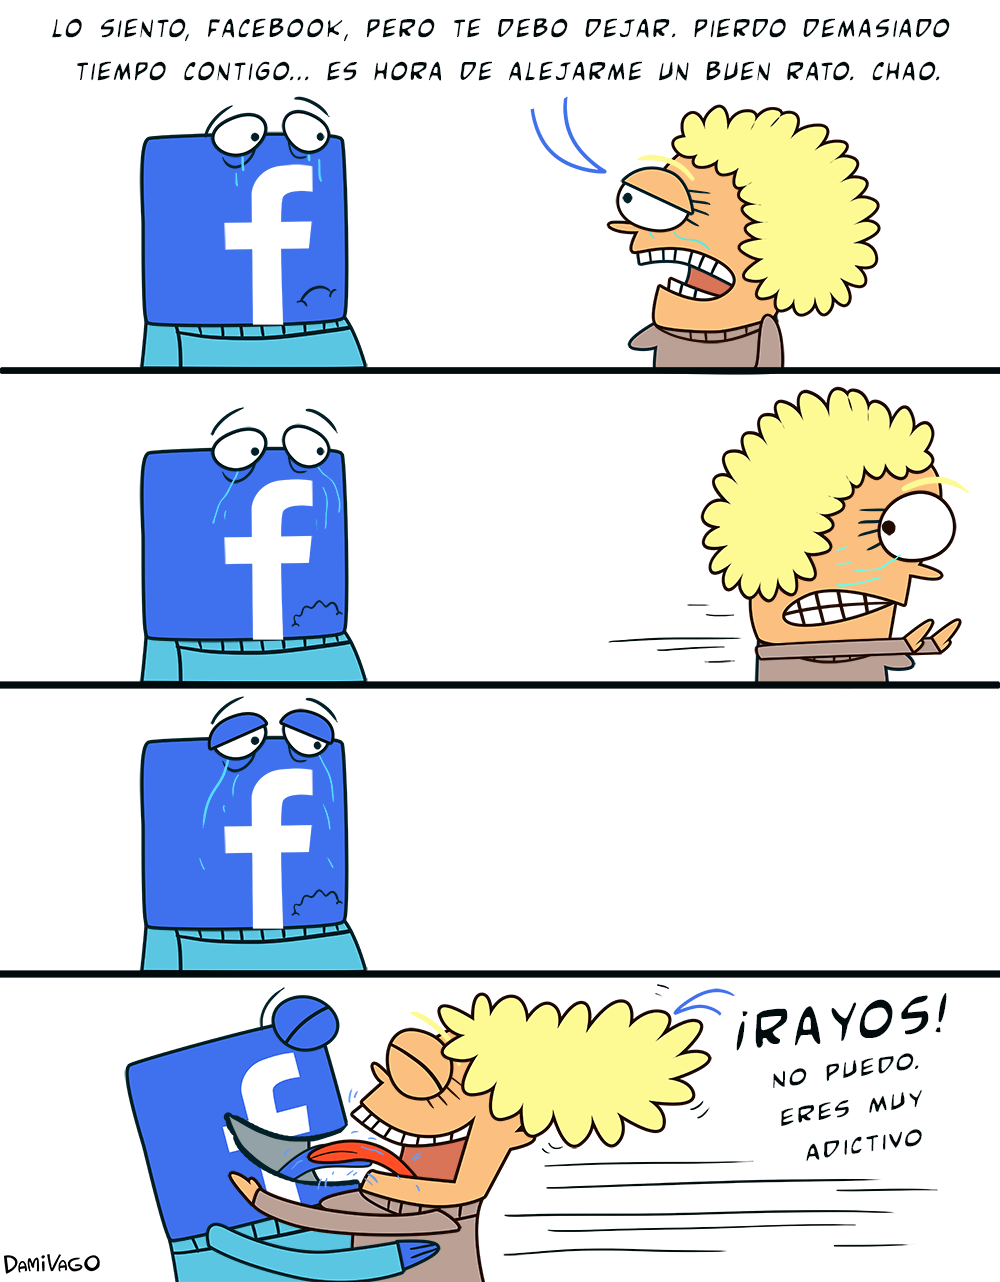 Damivago Nº 303: Abandonar Facebook